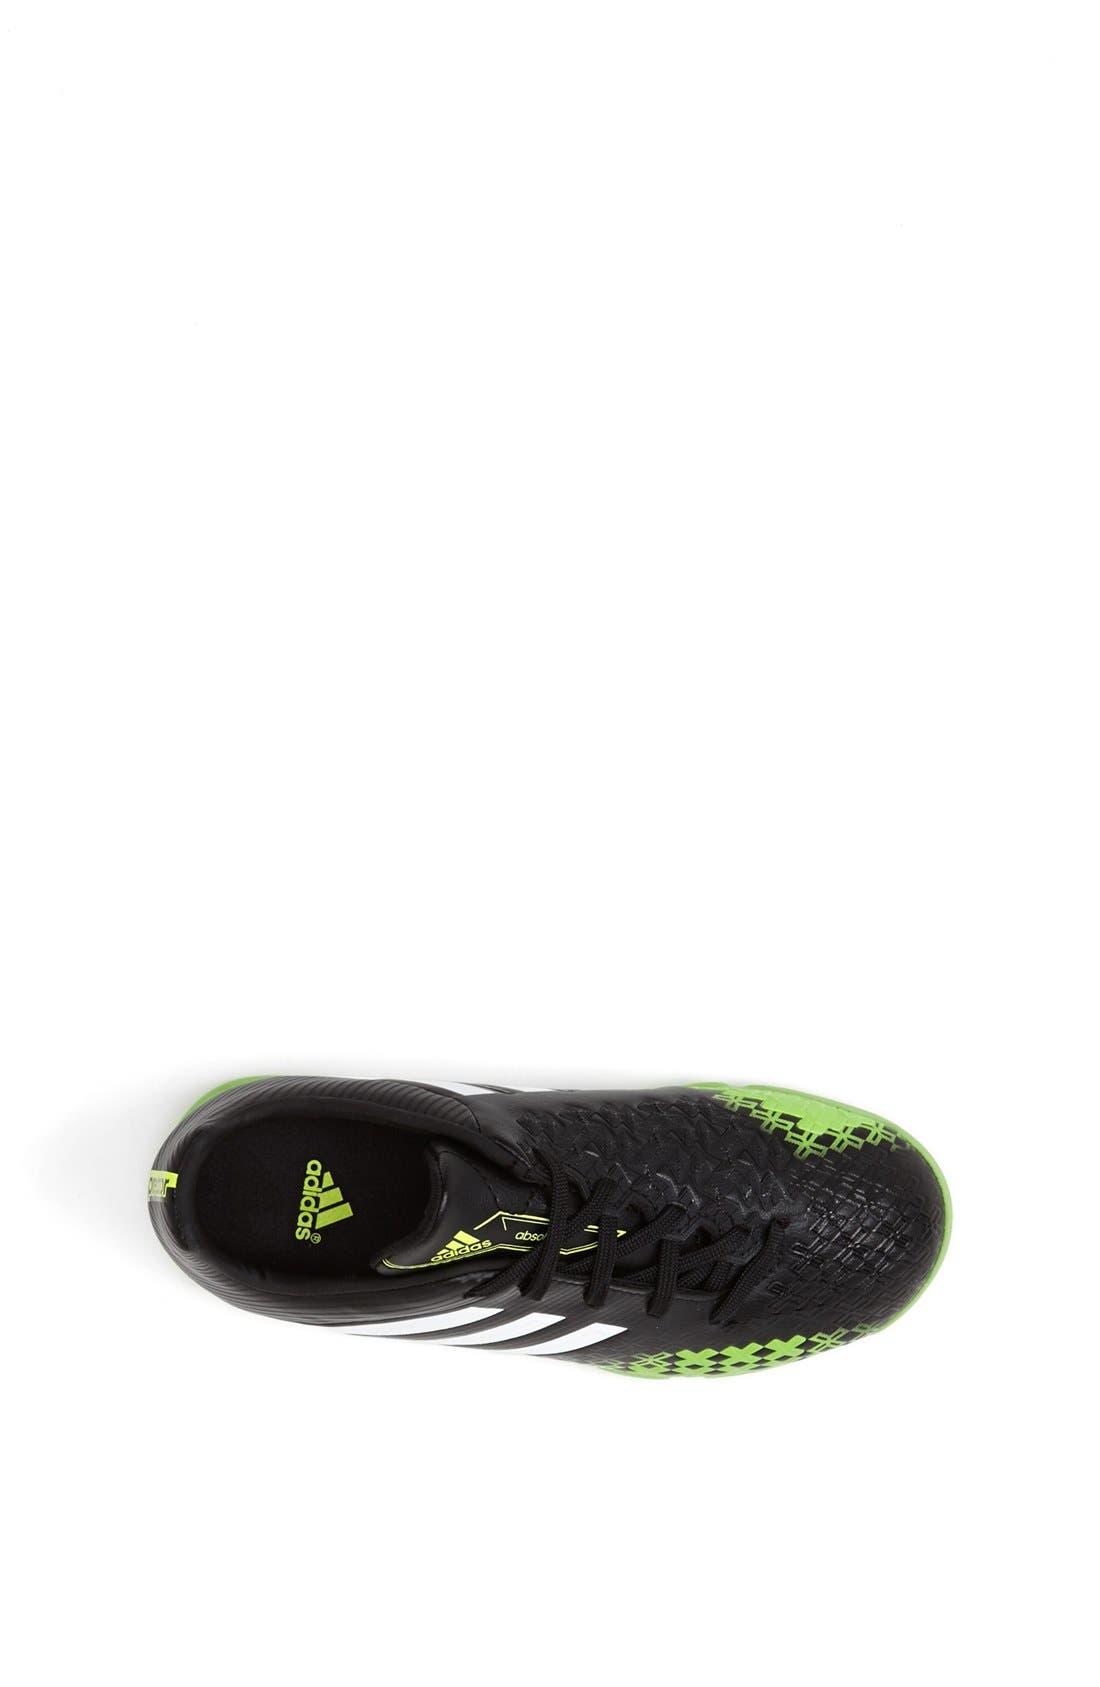 Alternate Image 3  - adidas 'Predator Absolado LZ TRX TF' Soccer Shoe (Toddler, Little Kid & Big Kid)